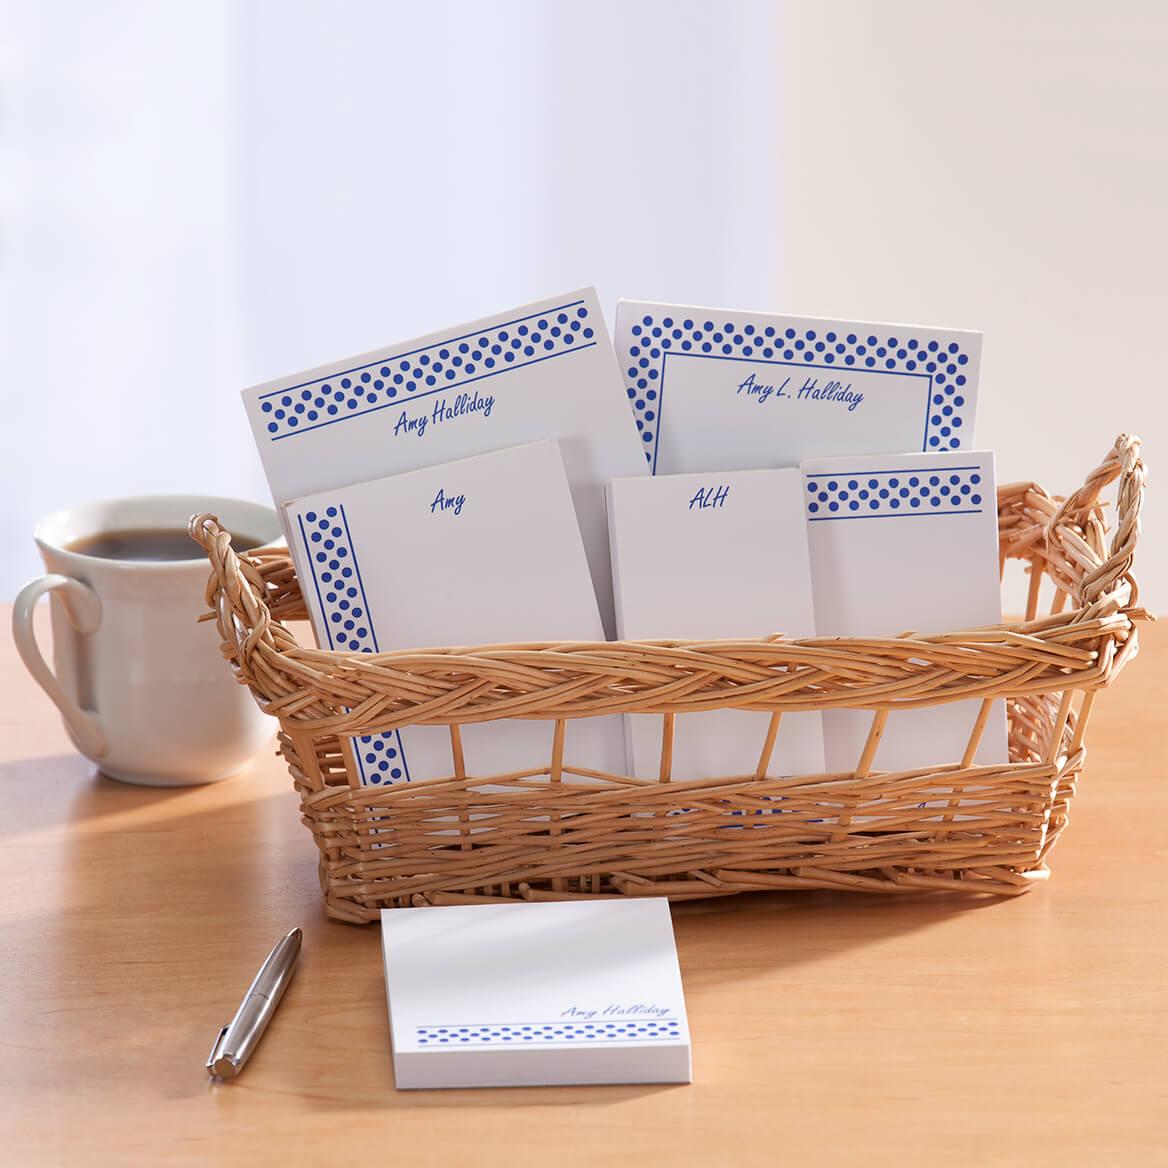 Personalized Polka Dots Basketful of Notepads-349461